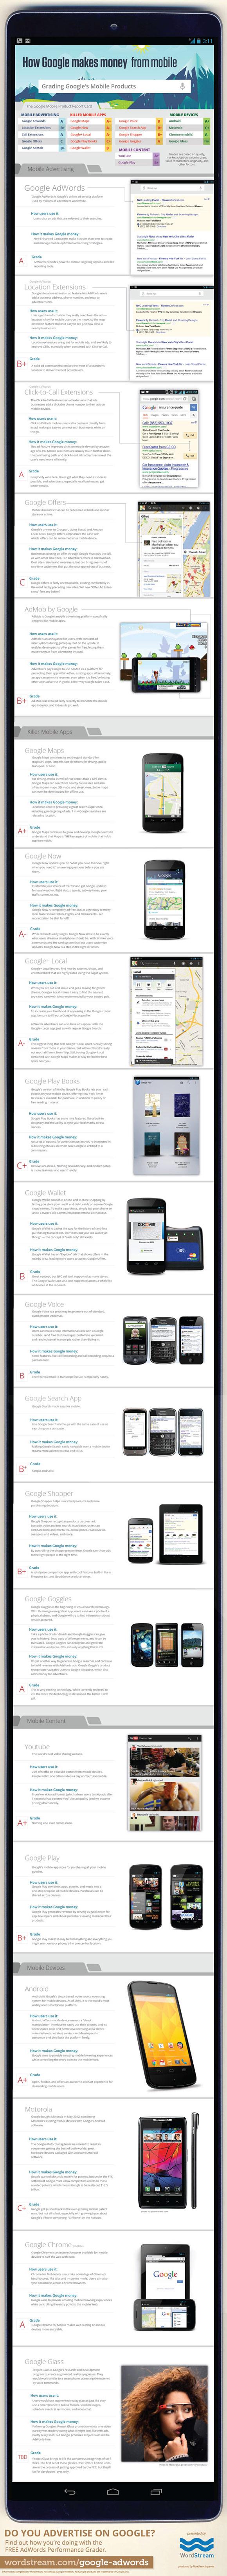 google-mobile-monetization2